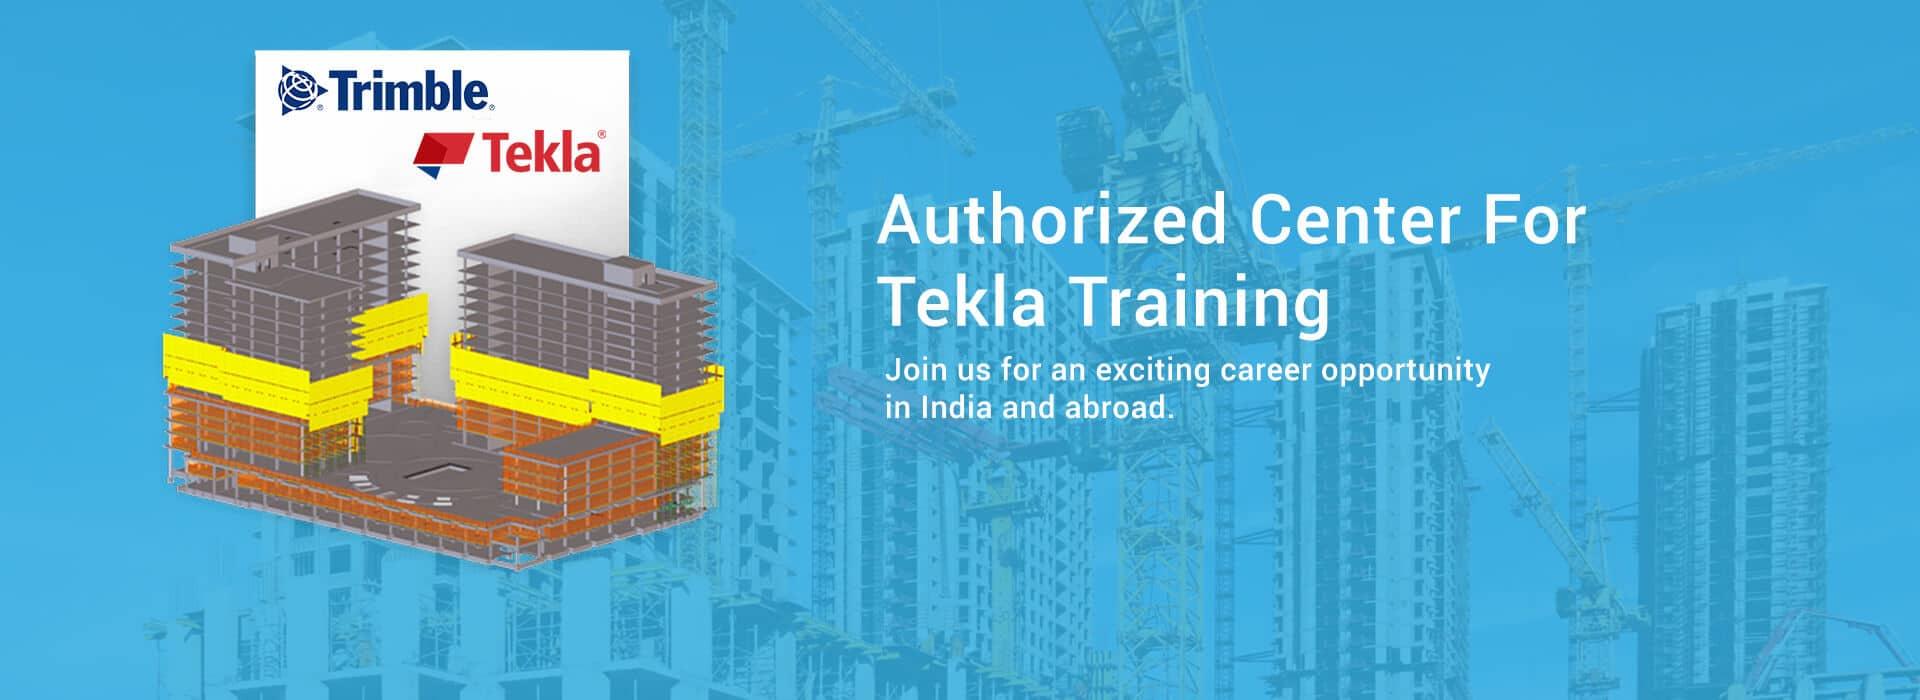 Telitek Engineering -Trimble Authorized Center For Tekla